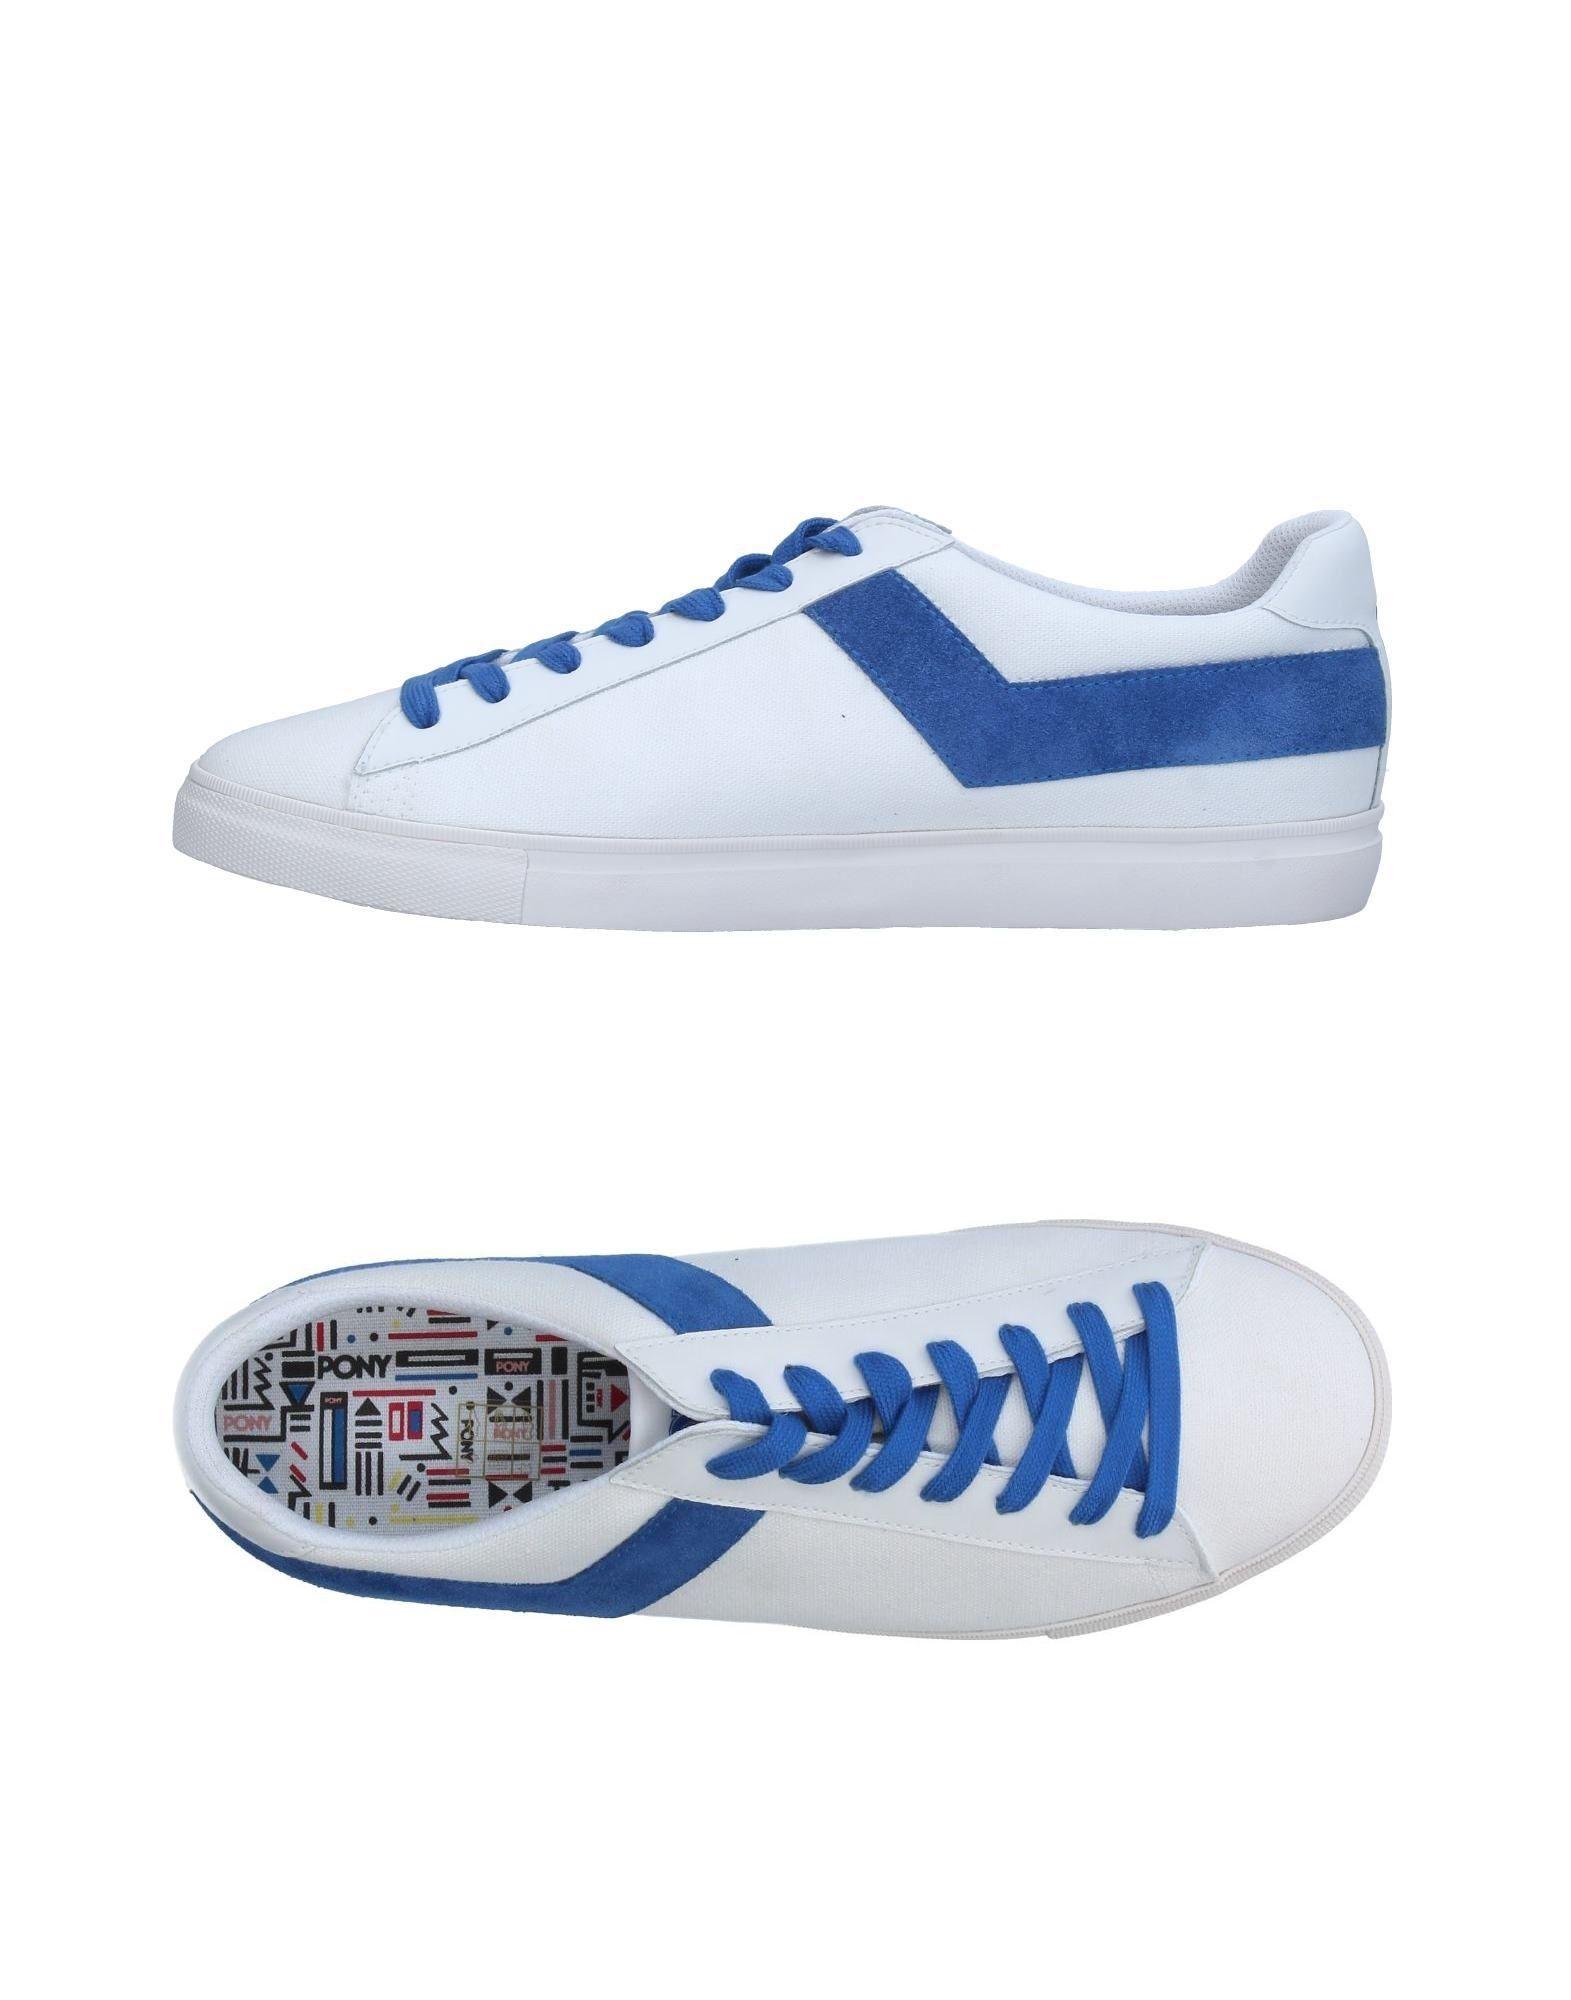 Pony Sneakers - Men Pony Sneakers online on 11340236MF  United Kingdom - 11340236MF on ebfbcc